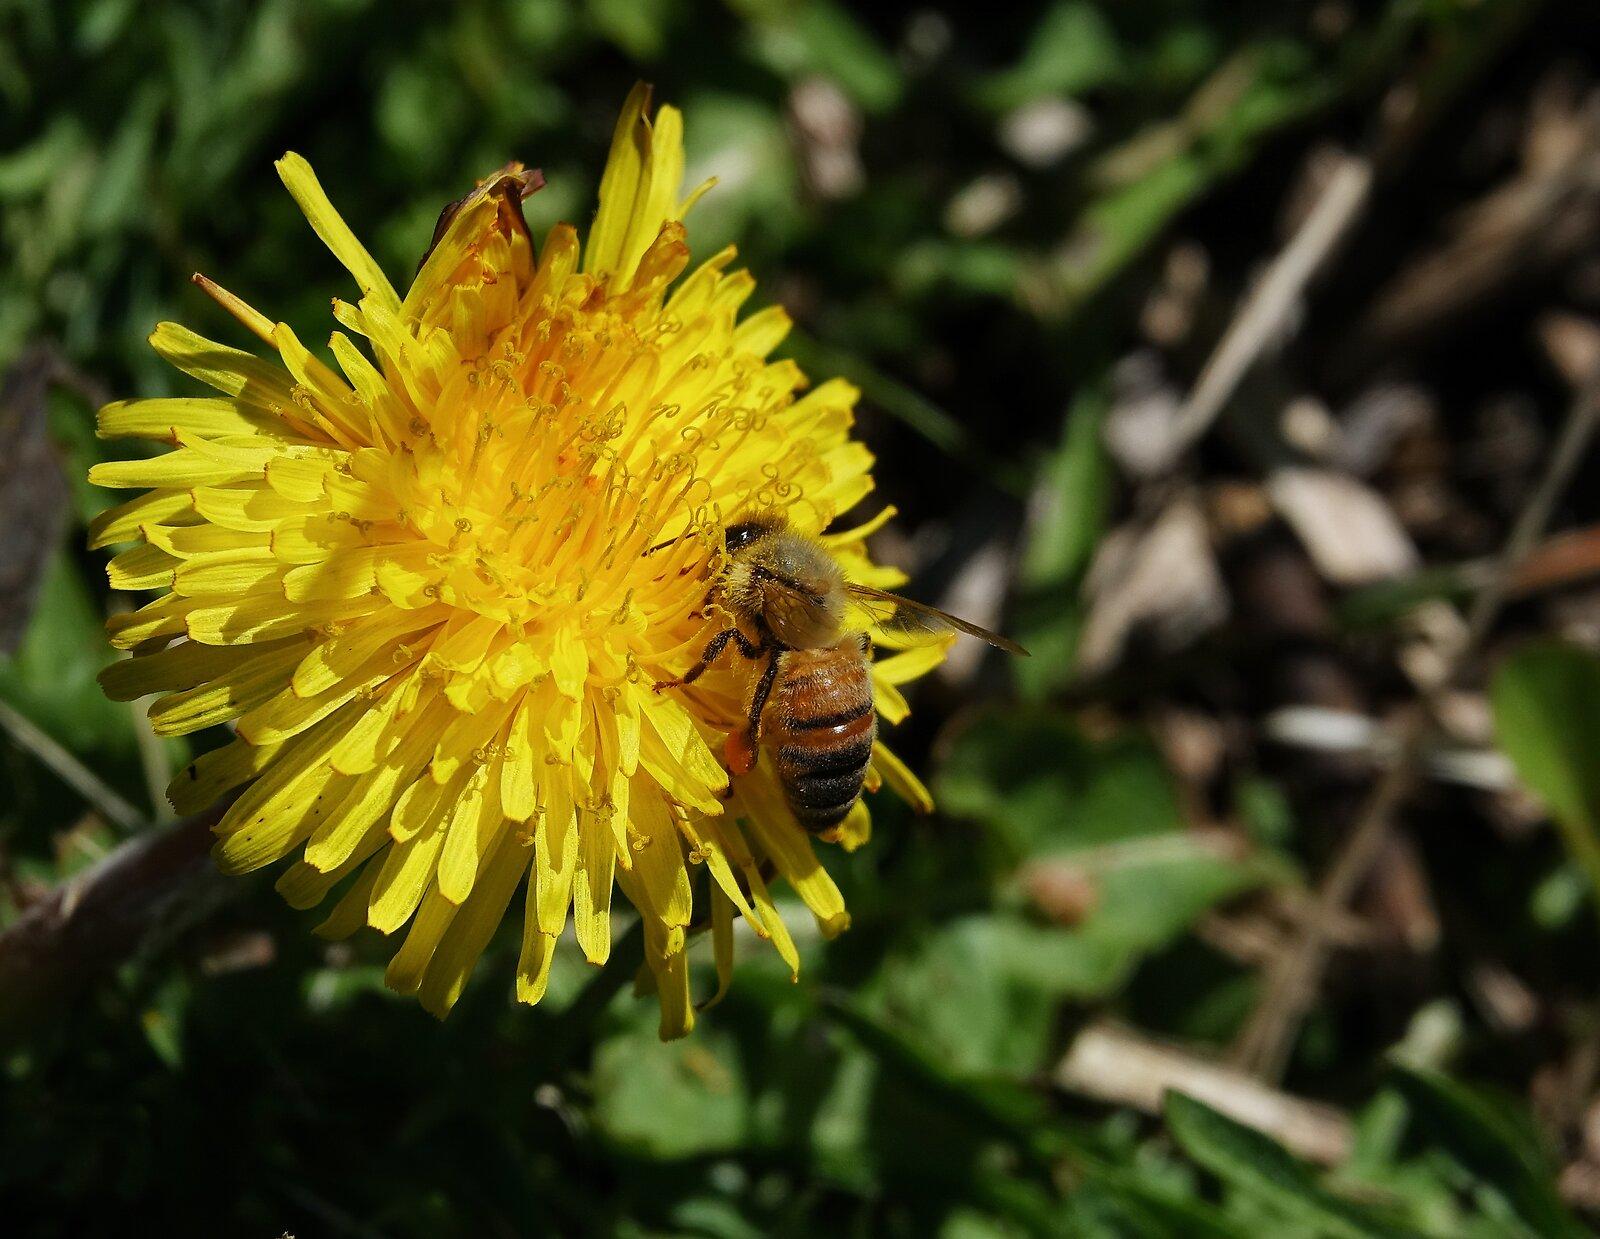 RX10_Apr5_21_busy_as_a_bee#2.jpg